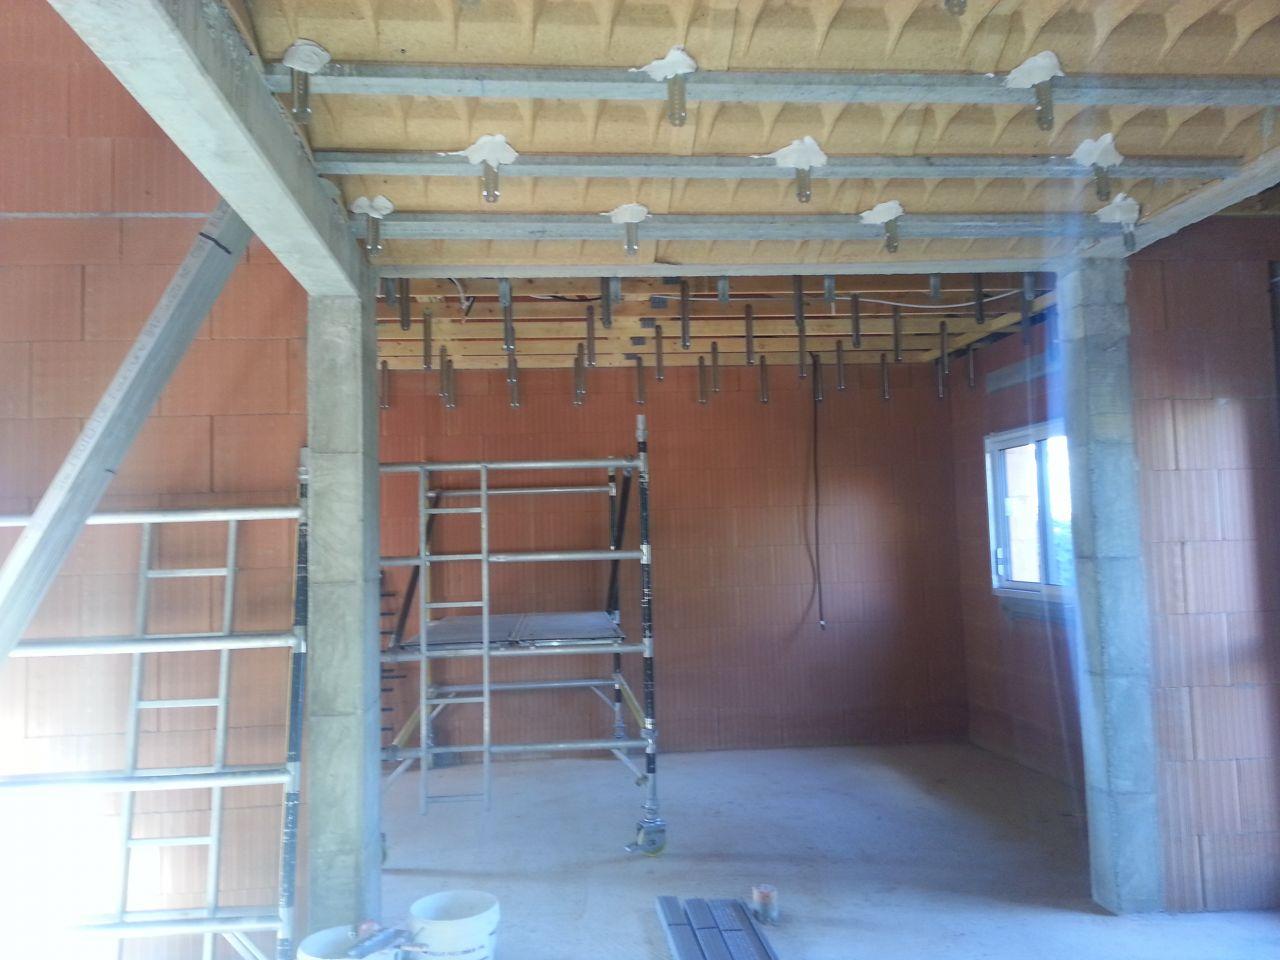 photo suspensions pour pose plafond isolation haute garonne 31. Black Bedroom Furniture Sets. Home Design Ideas